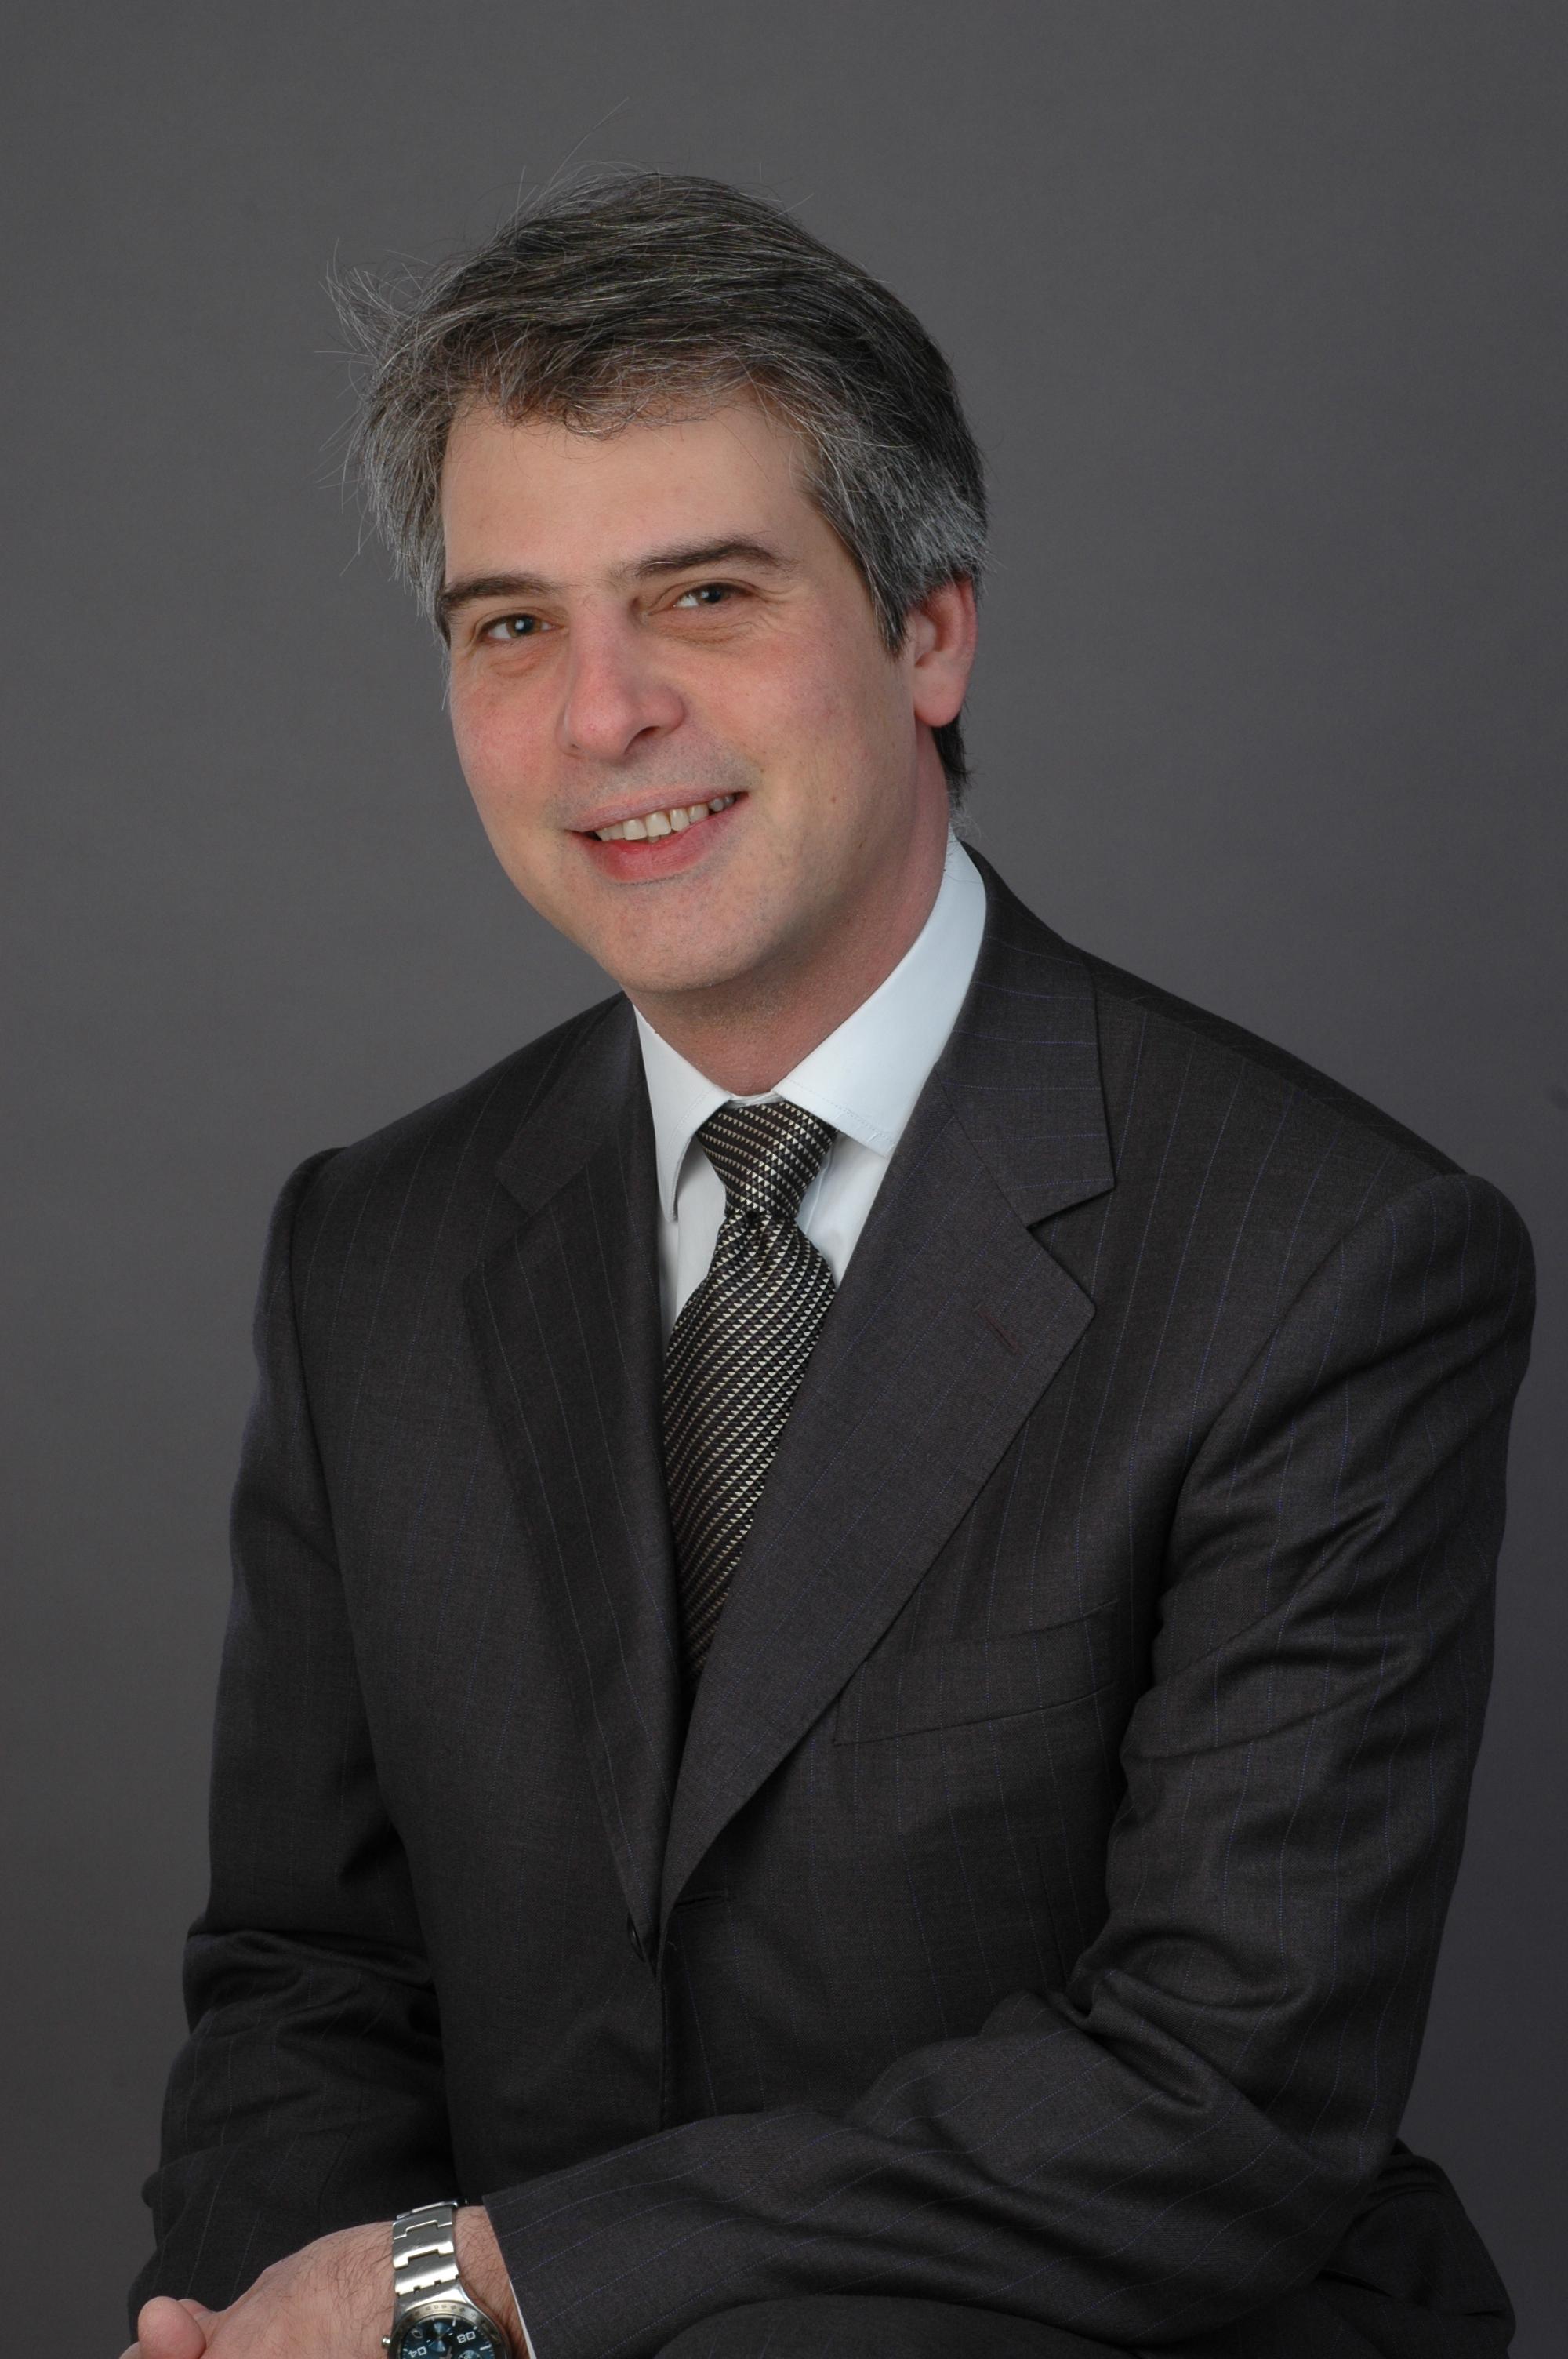 François Kayat